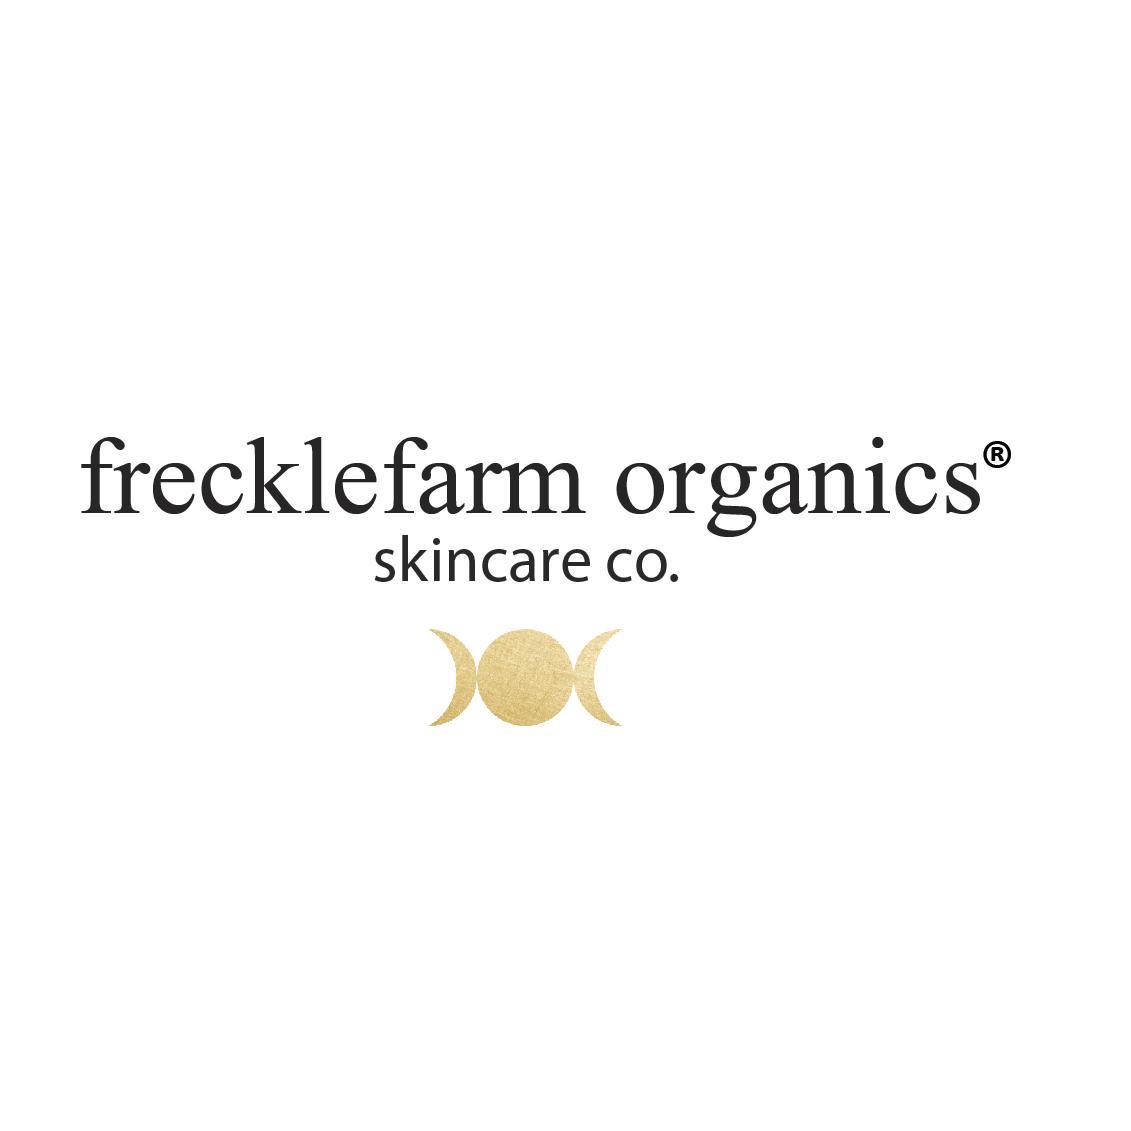 frecklefarm organics's logo